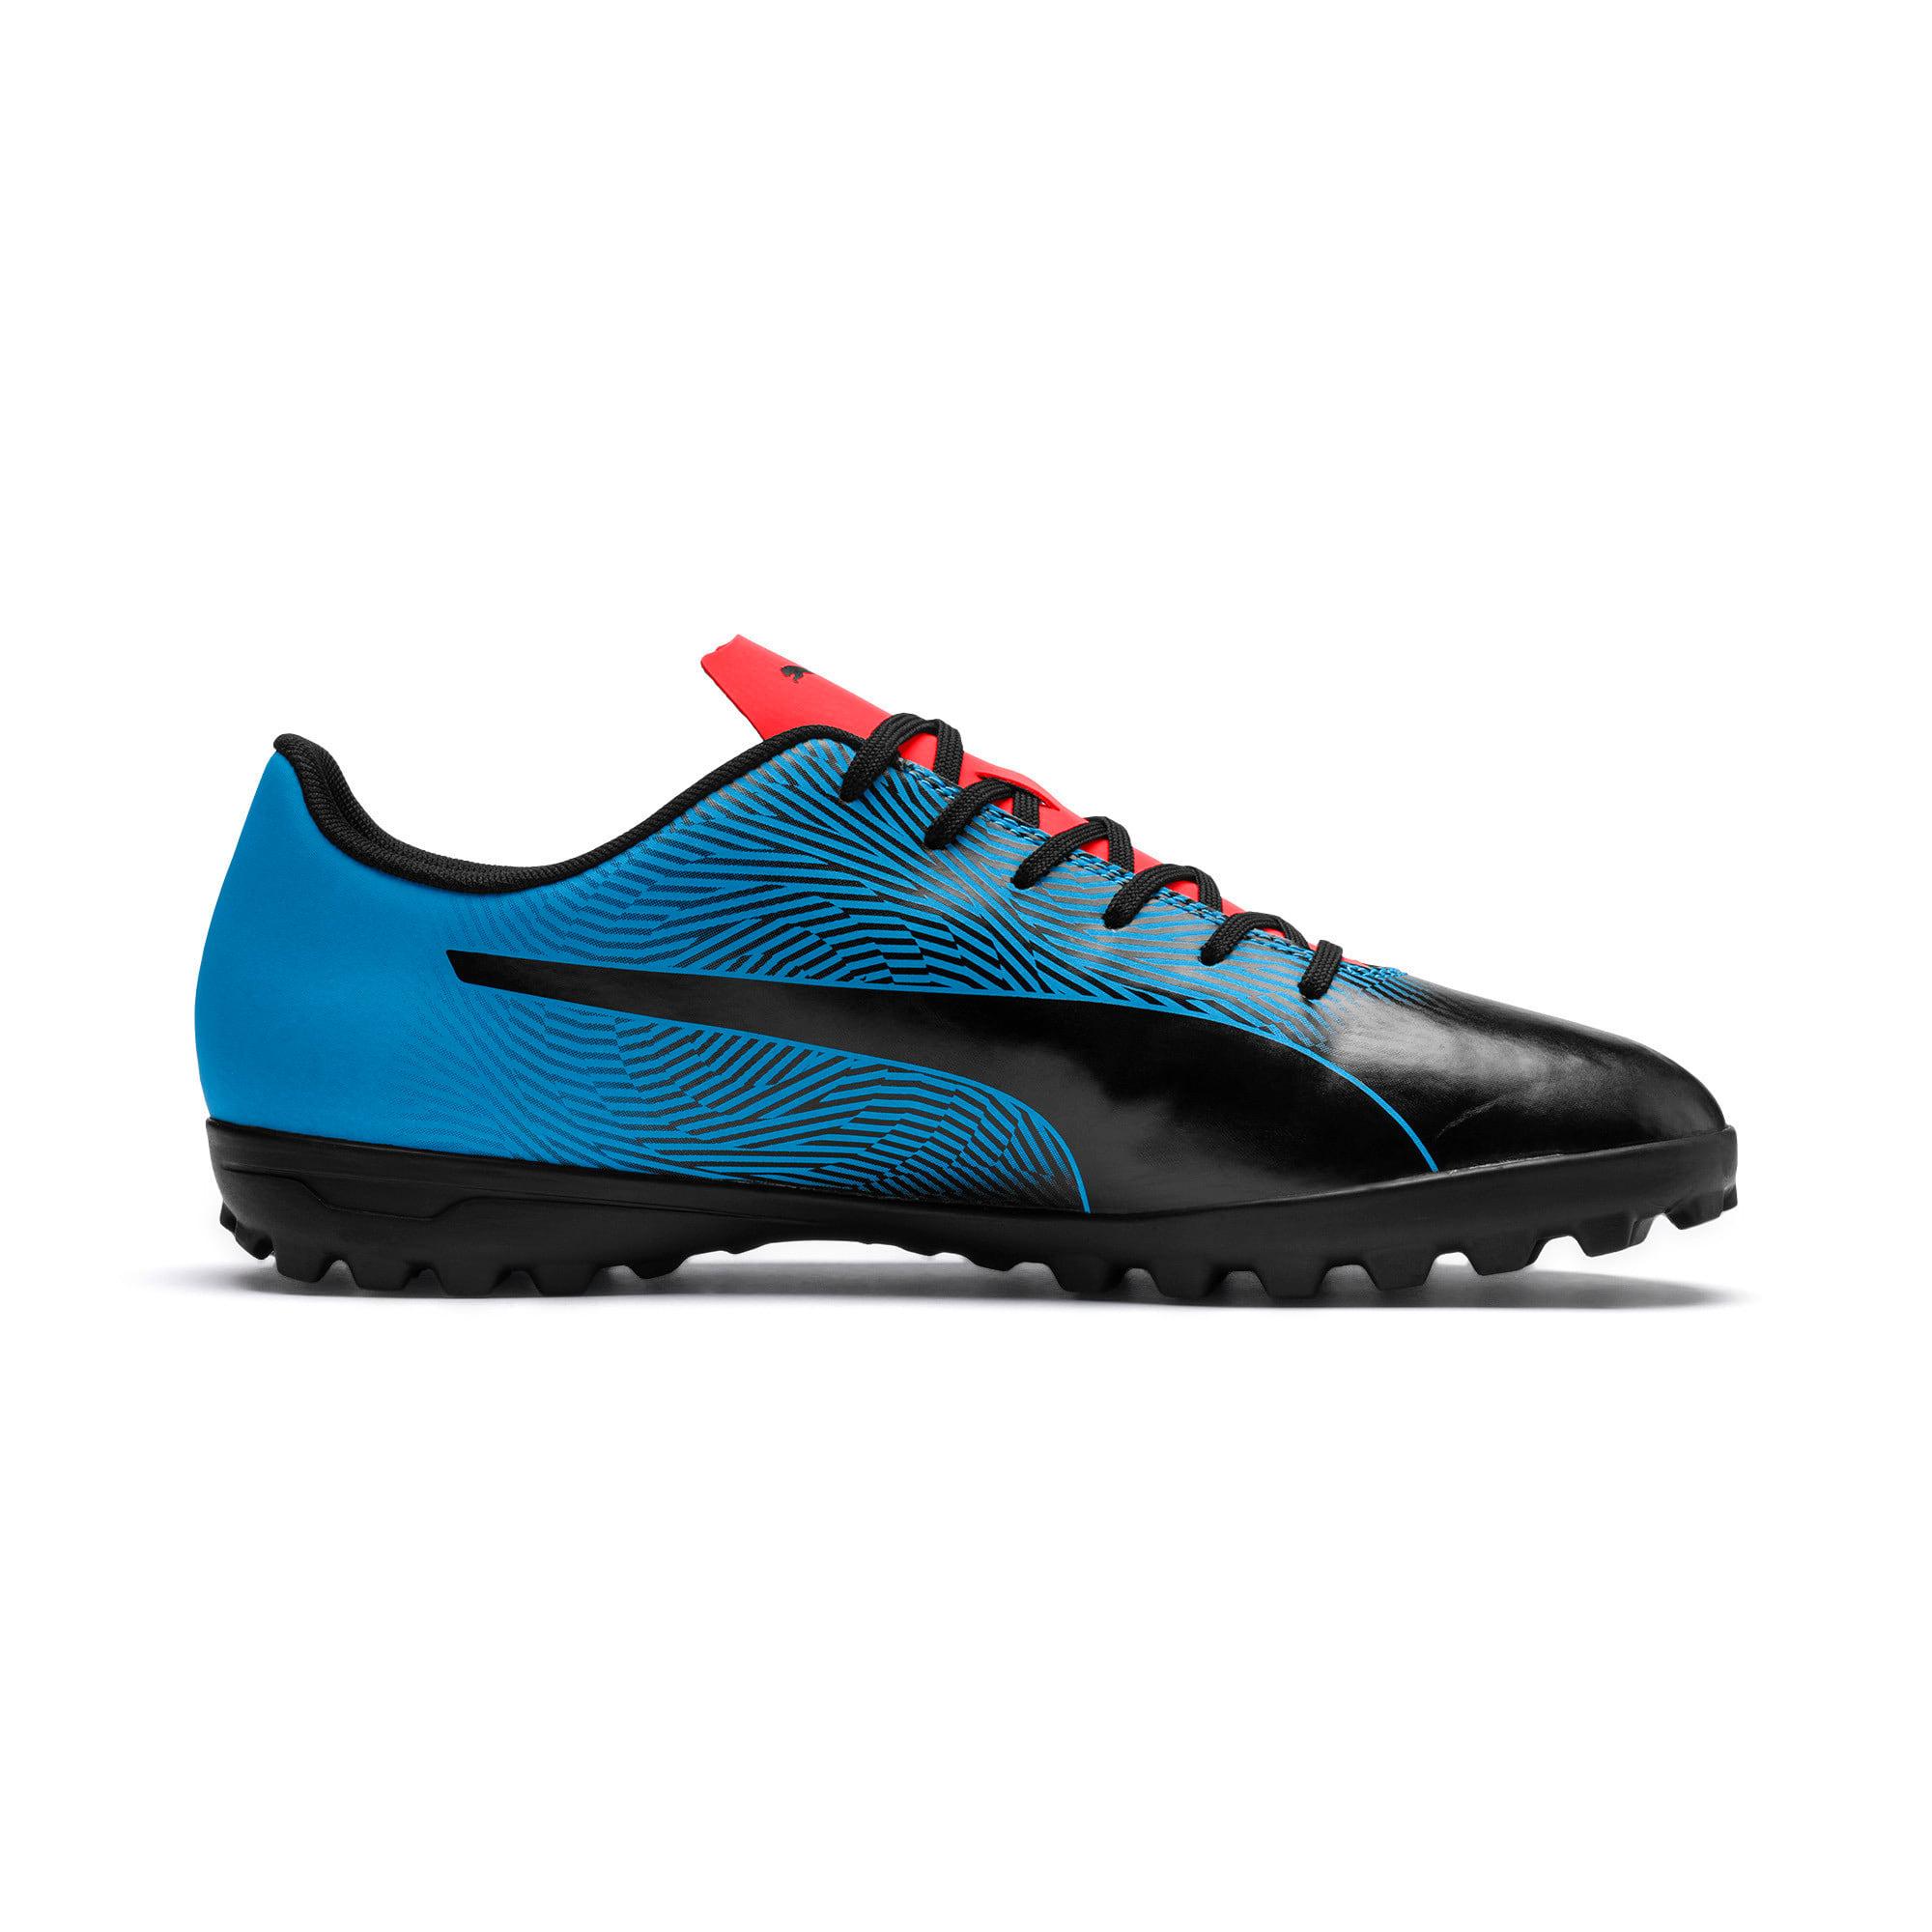 Thumbnail 5 of PUMA Spirit II TT Men's Soccer Shoes, Black-Bleu Azur-Red Blast, medium